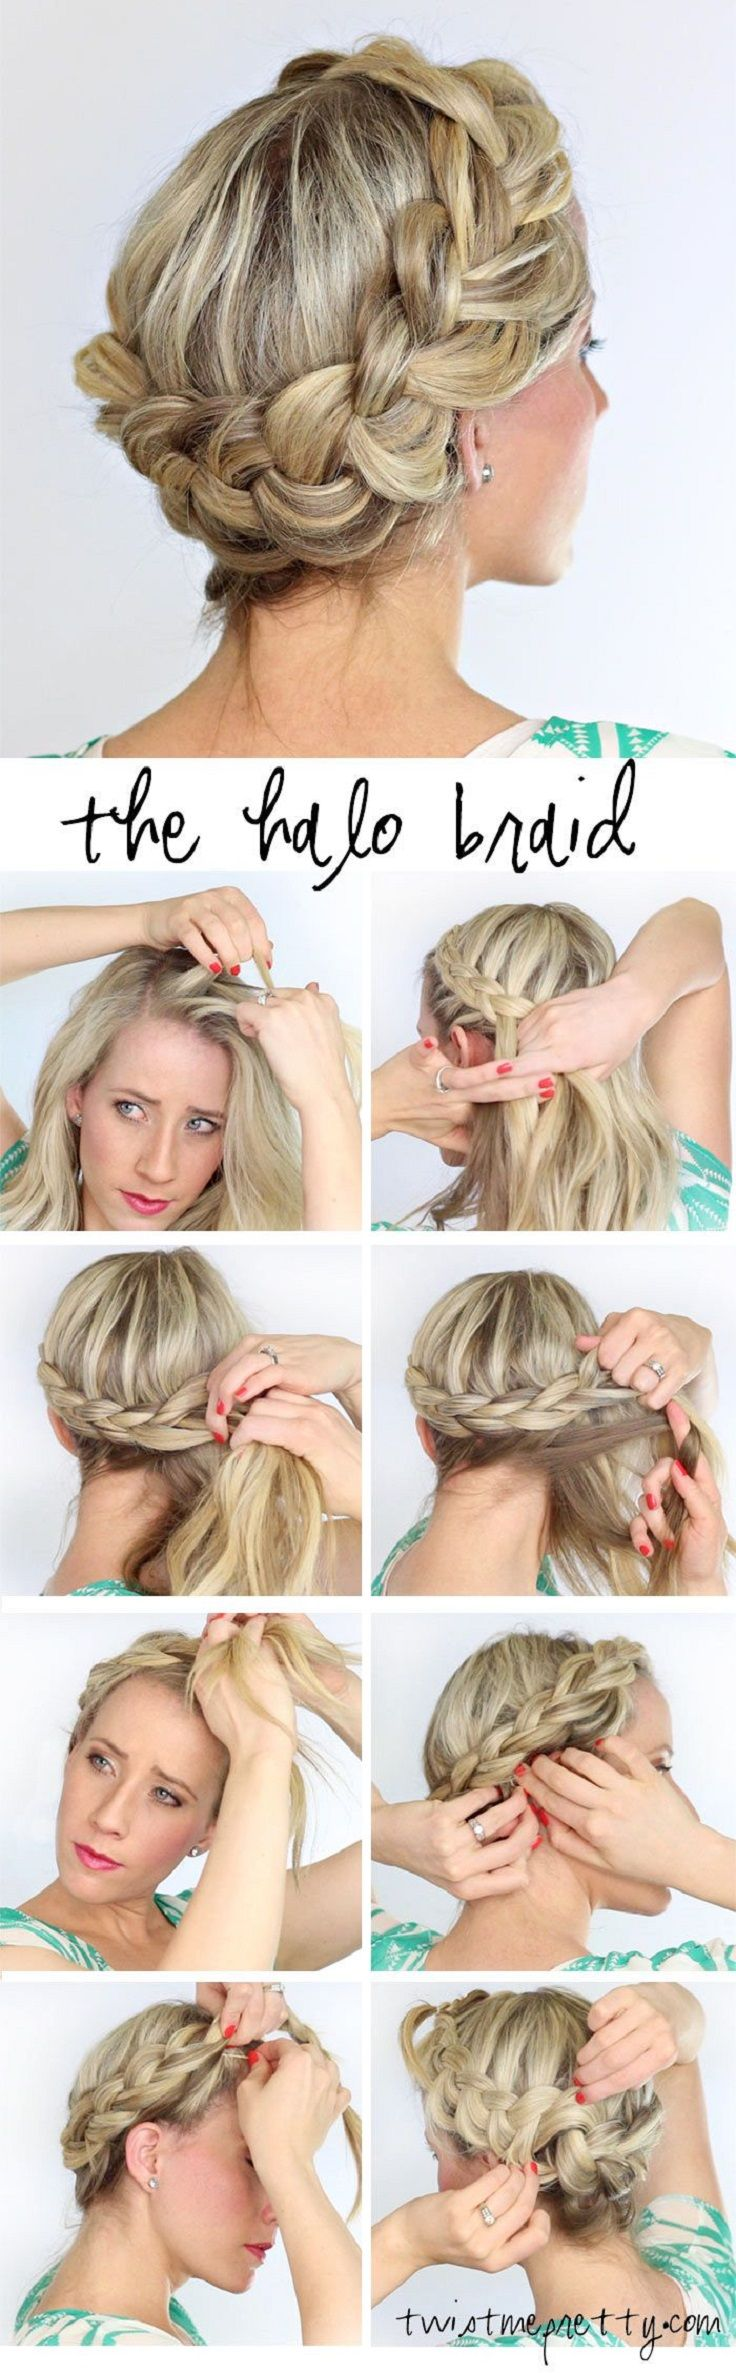 Groovy 1000 Ideas About Braided Crown Hairstyles On Pinterest Crown Short Hairstyles Gunalazisus